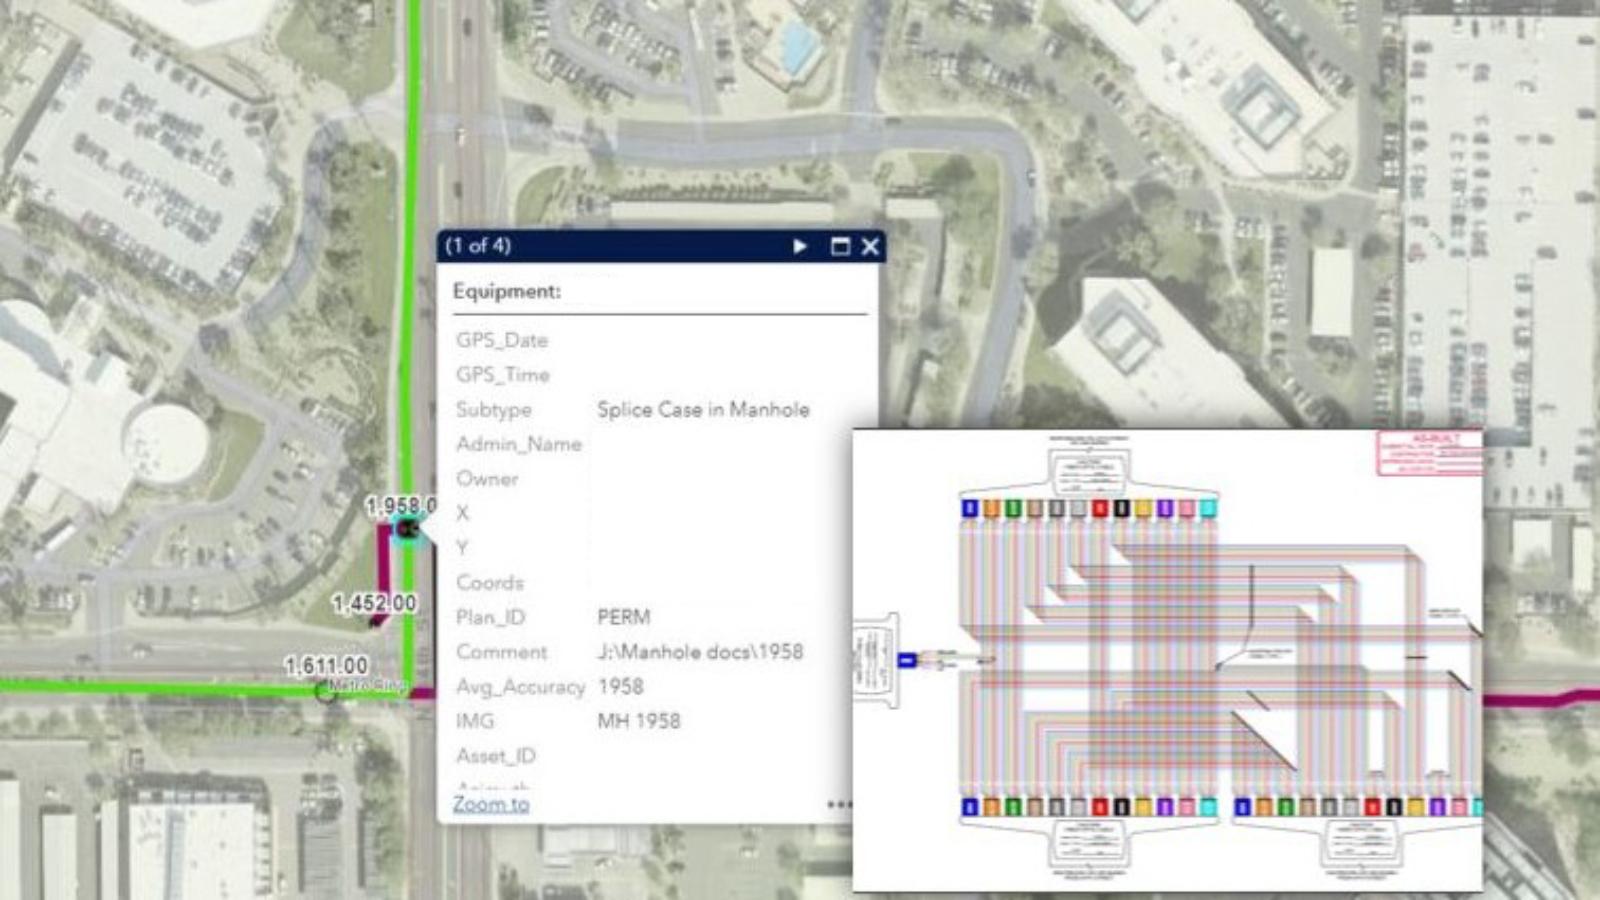 Fiber optics network management